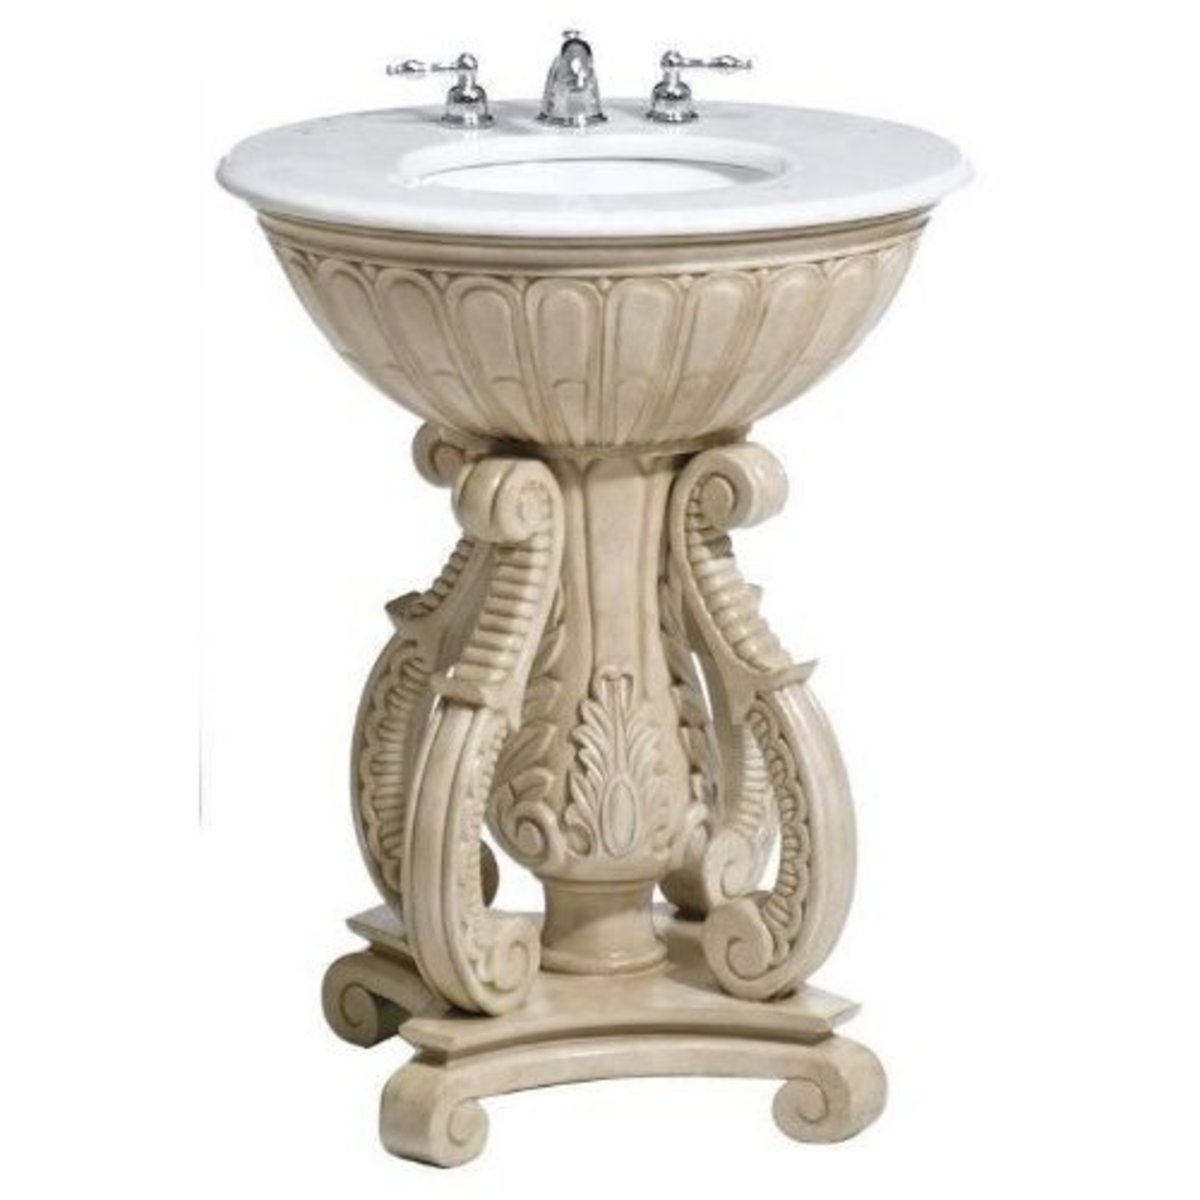 Pedestal bathroom sinks can be elegant!